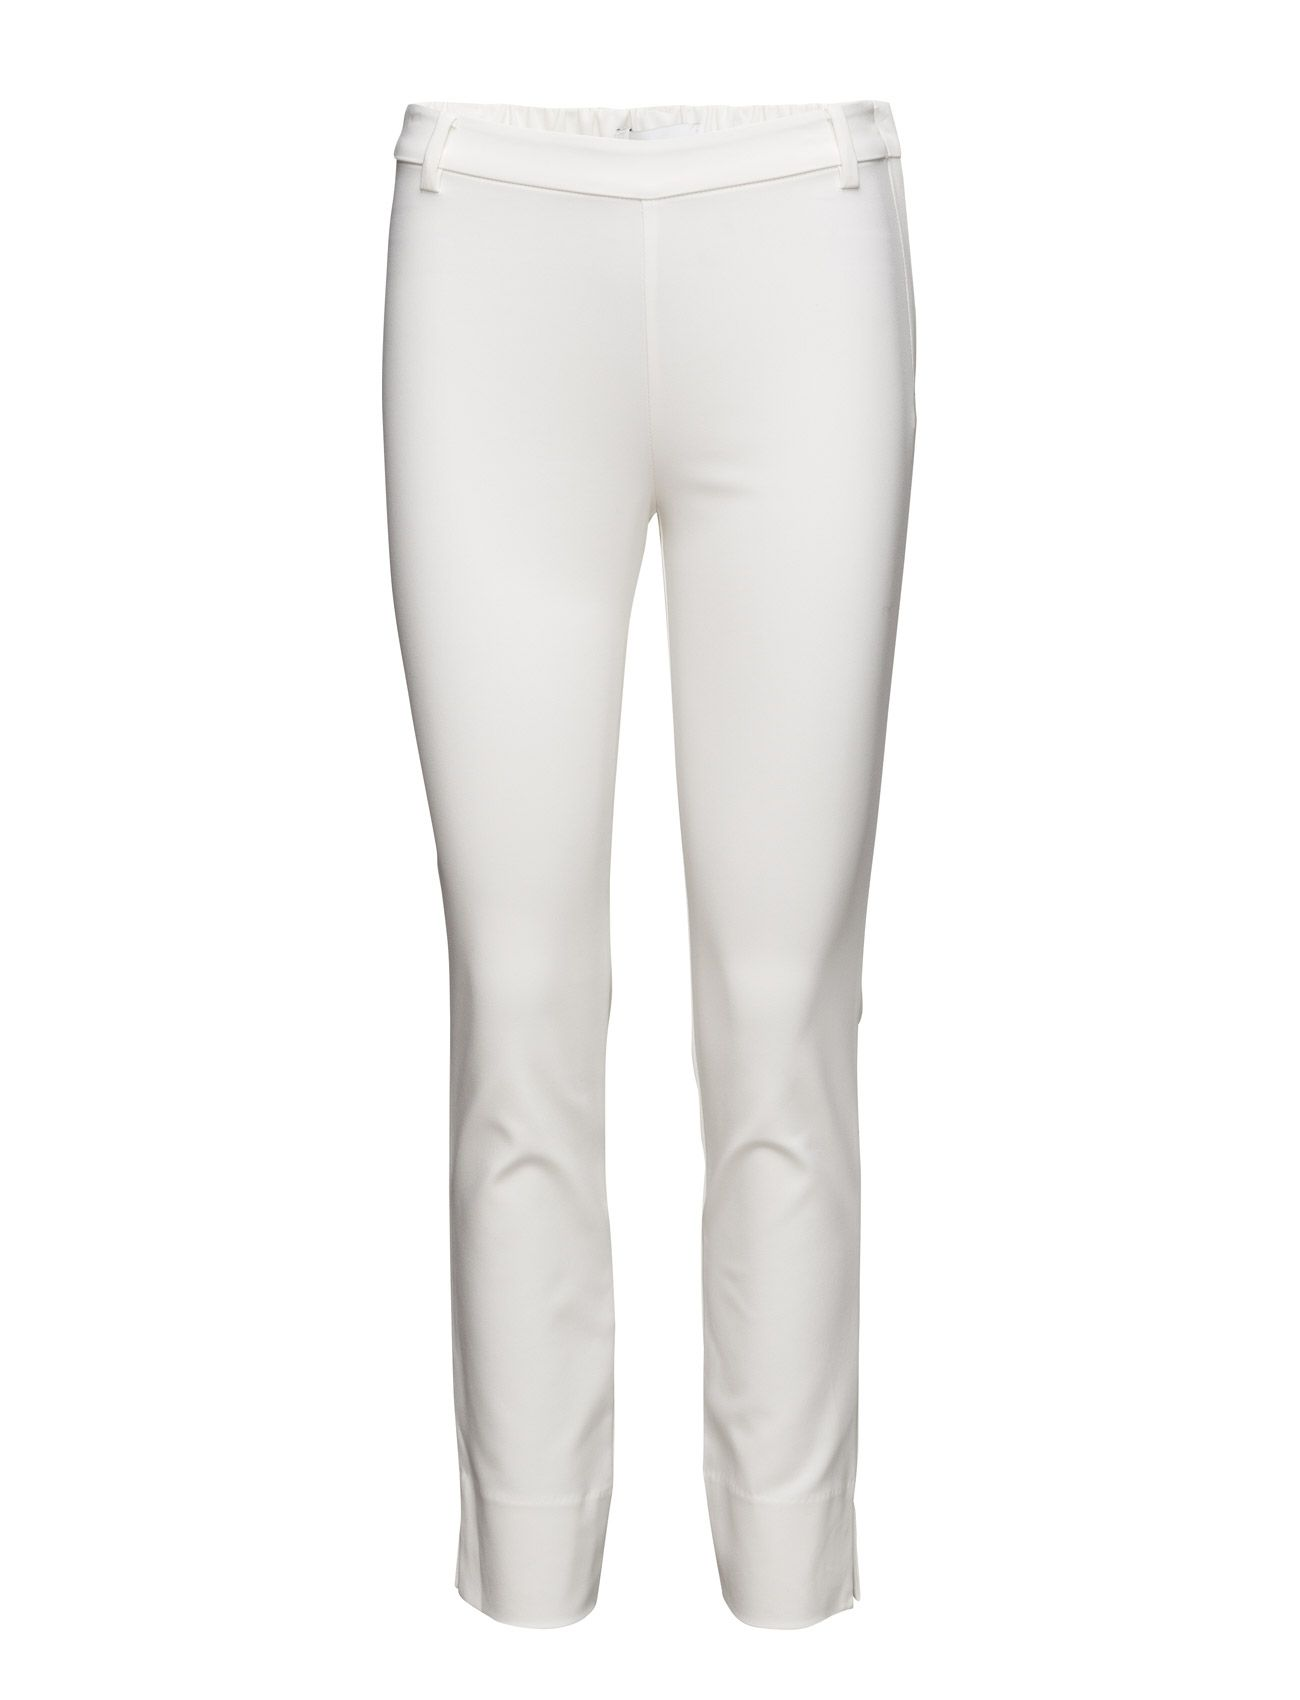 Samsøe & Samsøe Lugo pants 6272 housut slim fit valkoinen 99 e